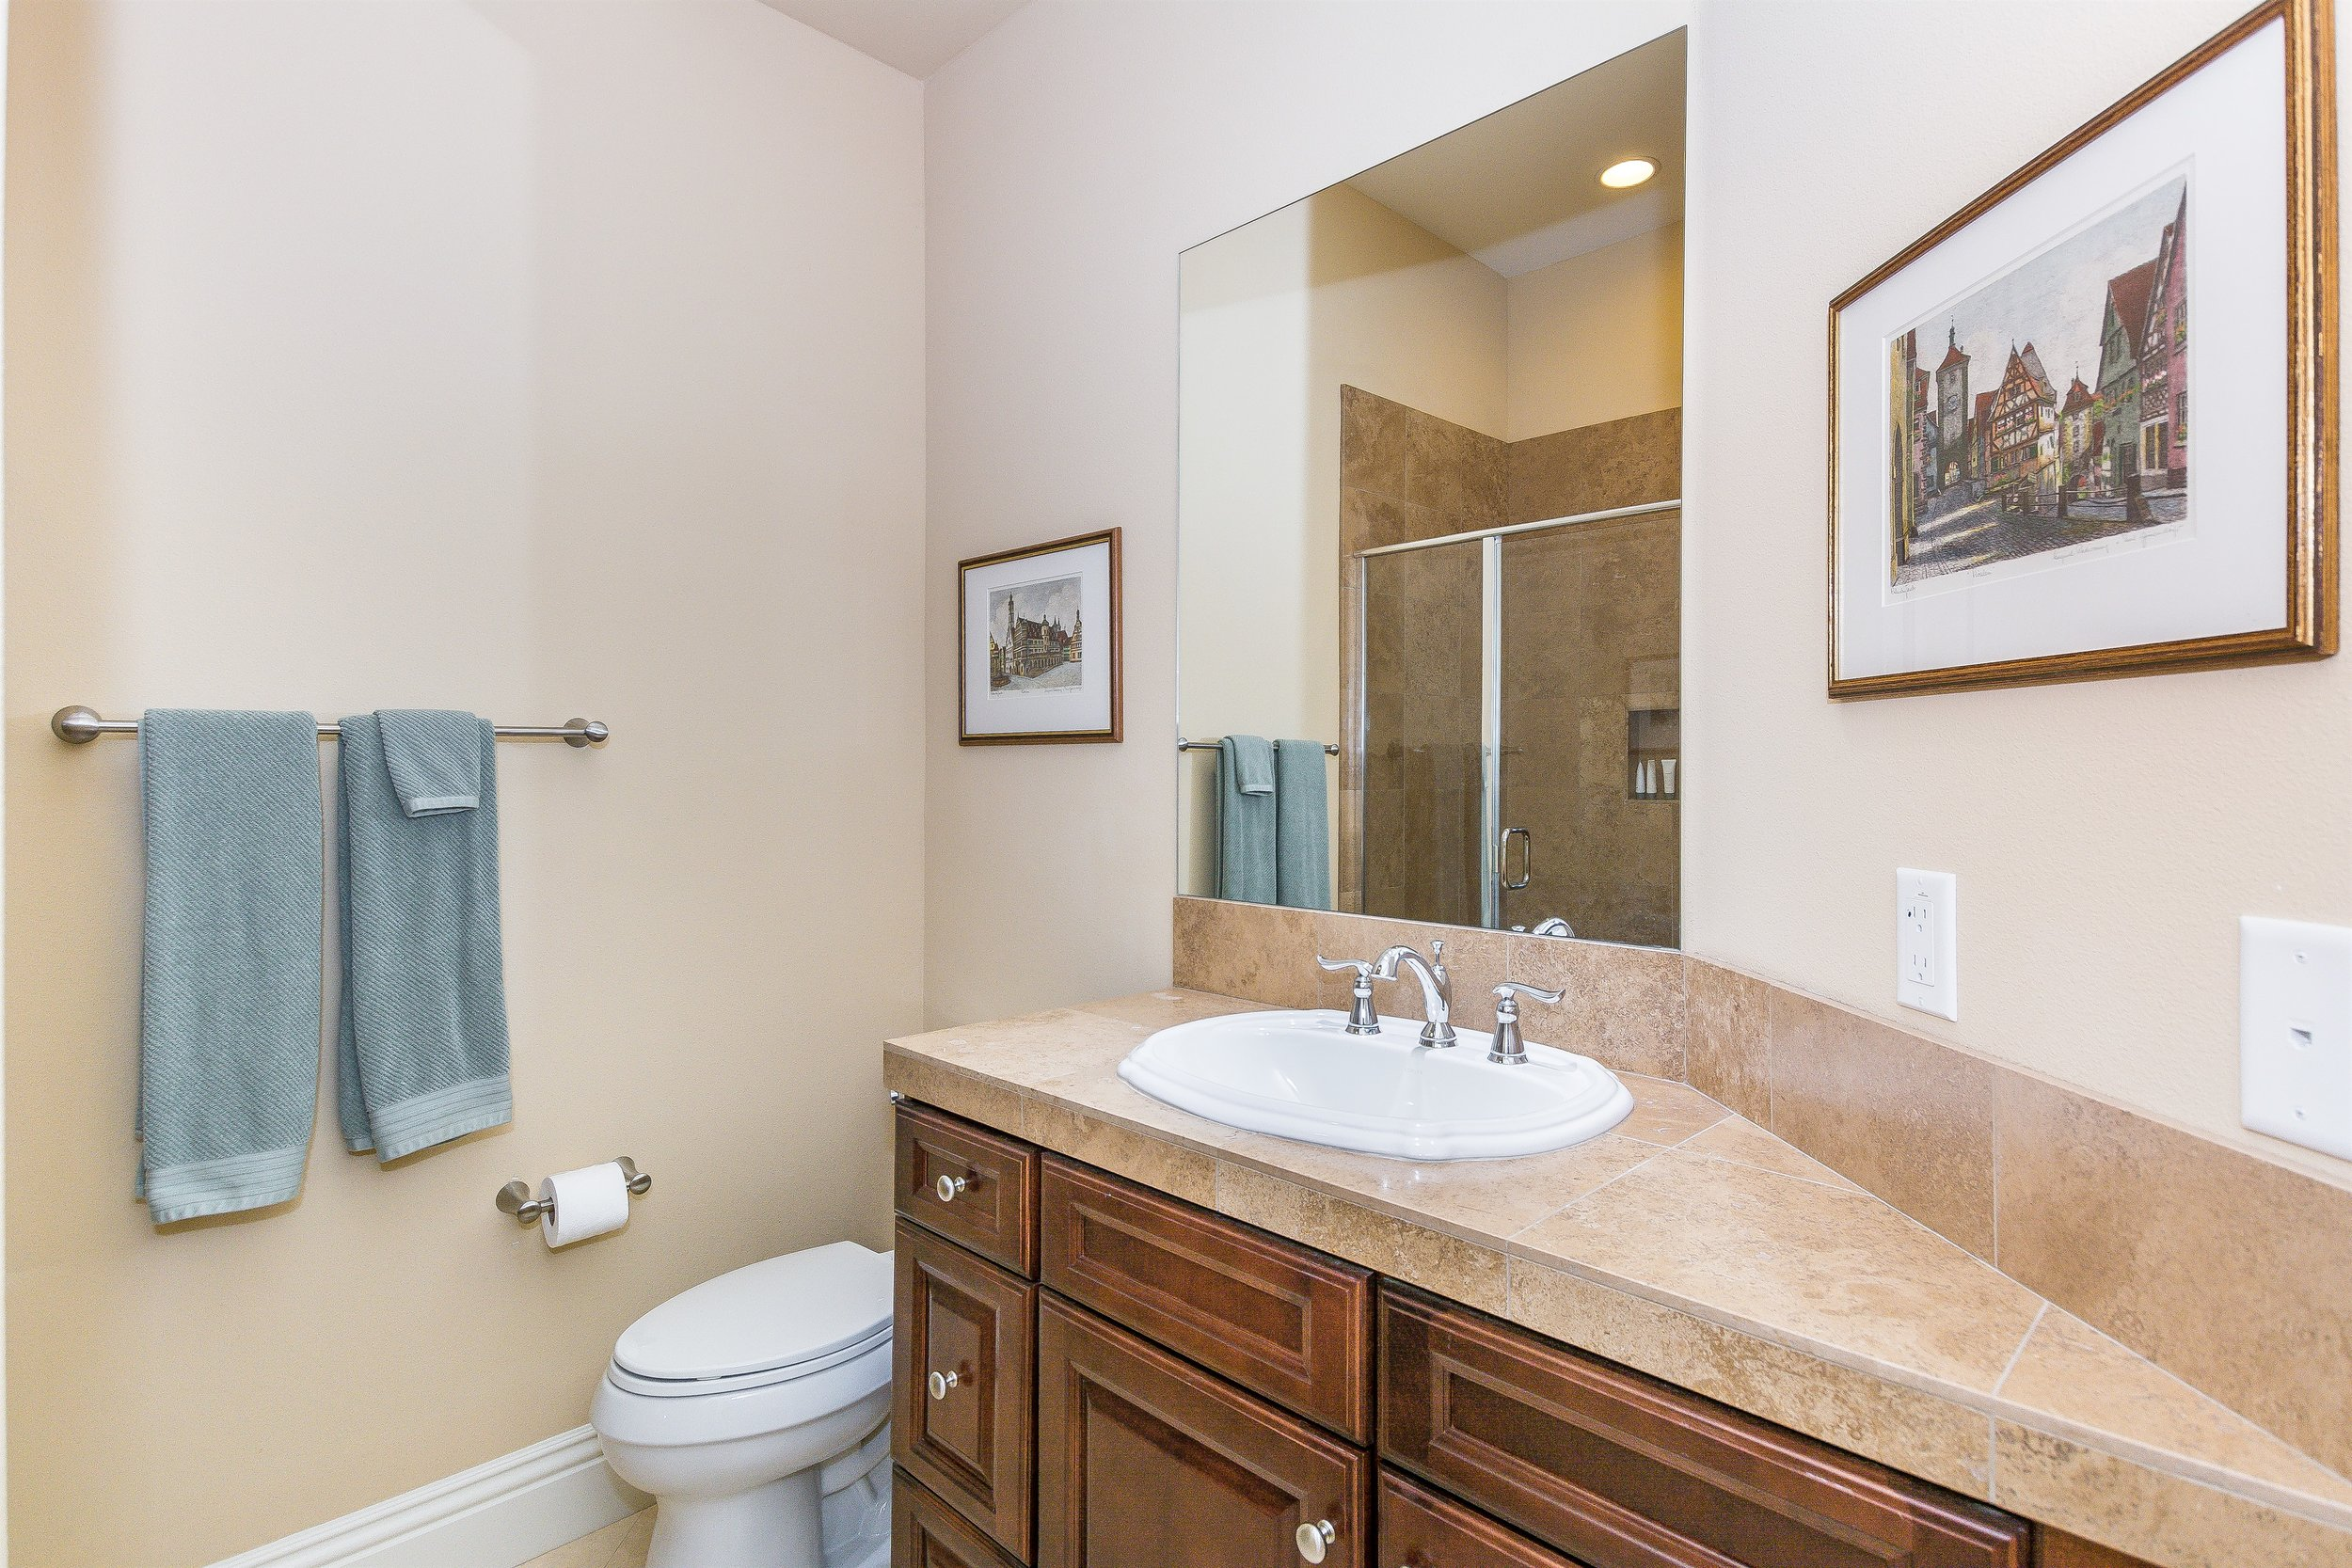 025_Bedroom 3 Bath.jpg